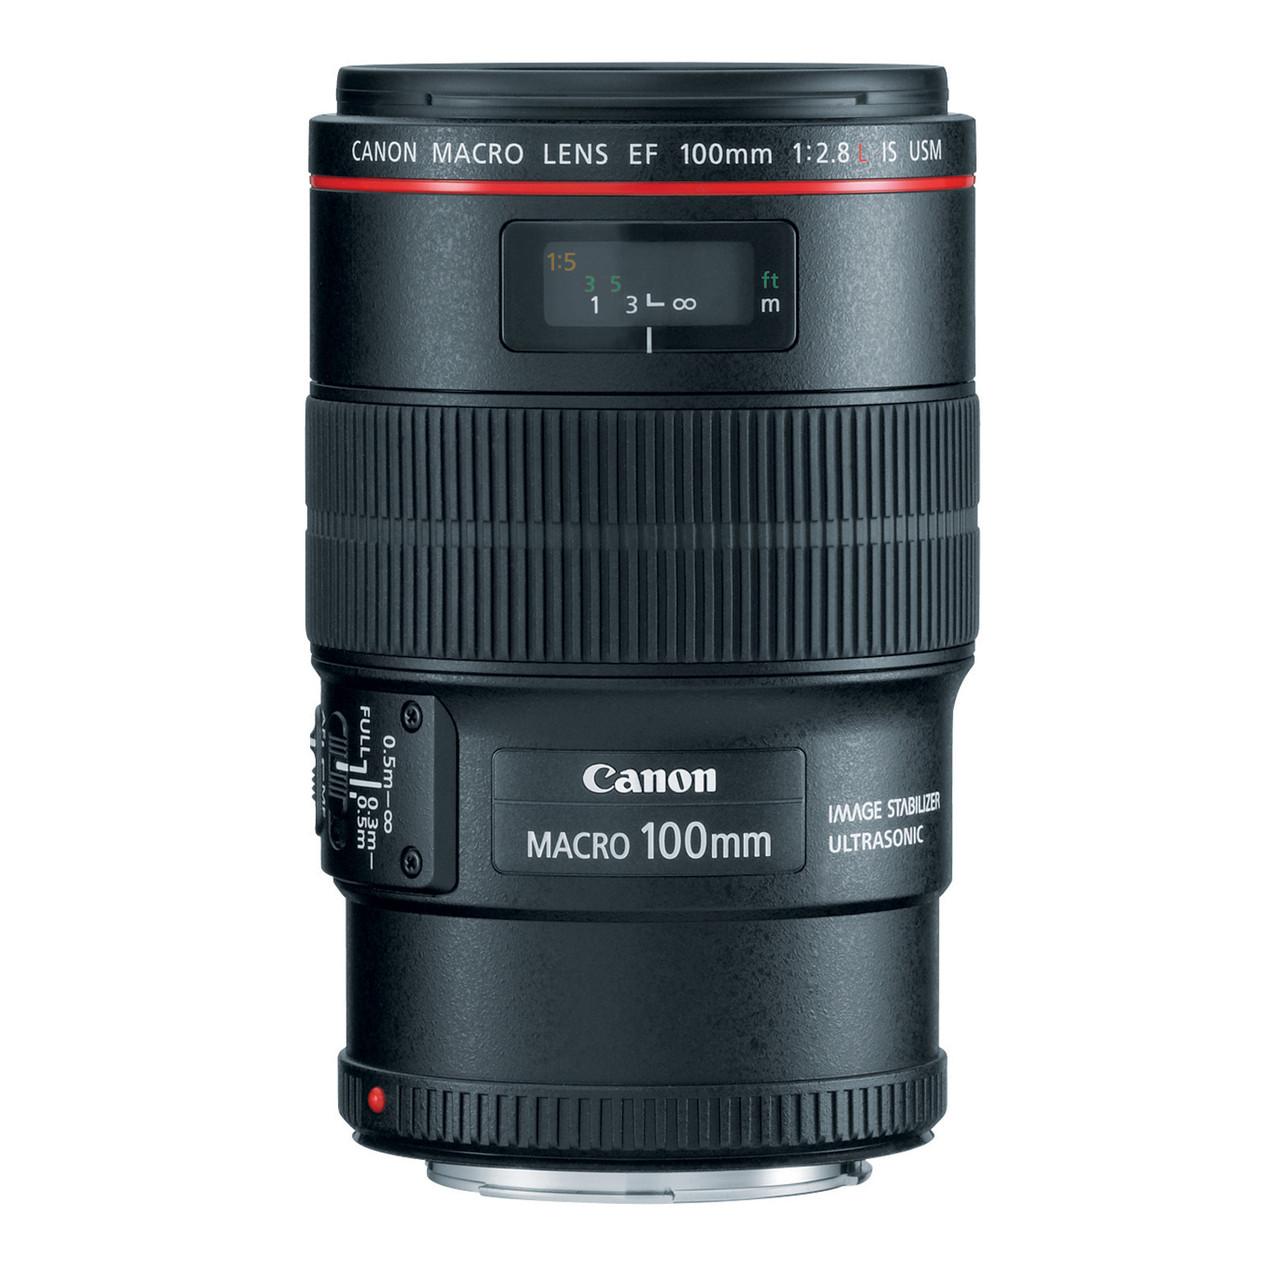 CANON EF 100MM F/2.8 L IS USM MACRO